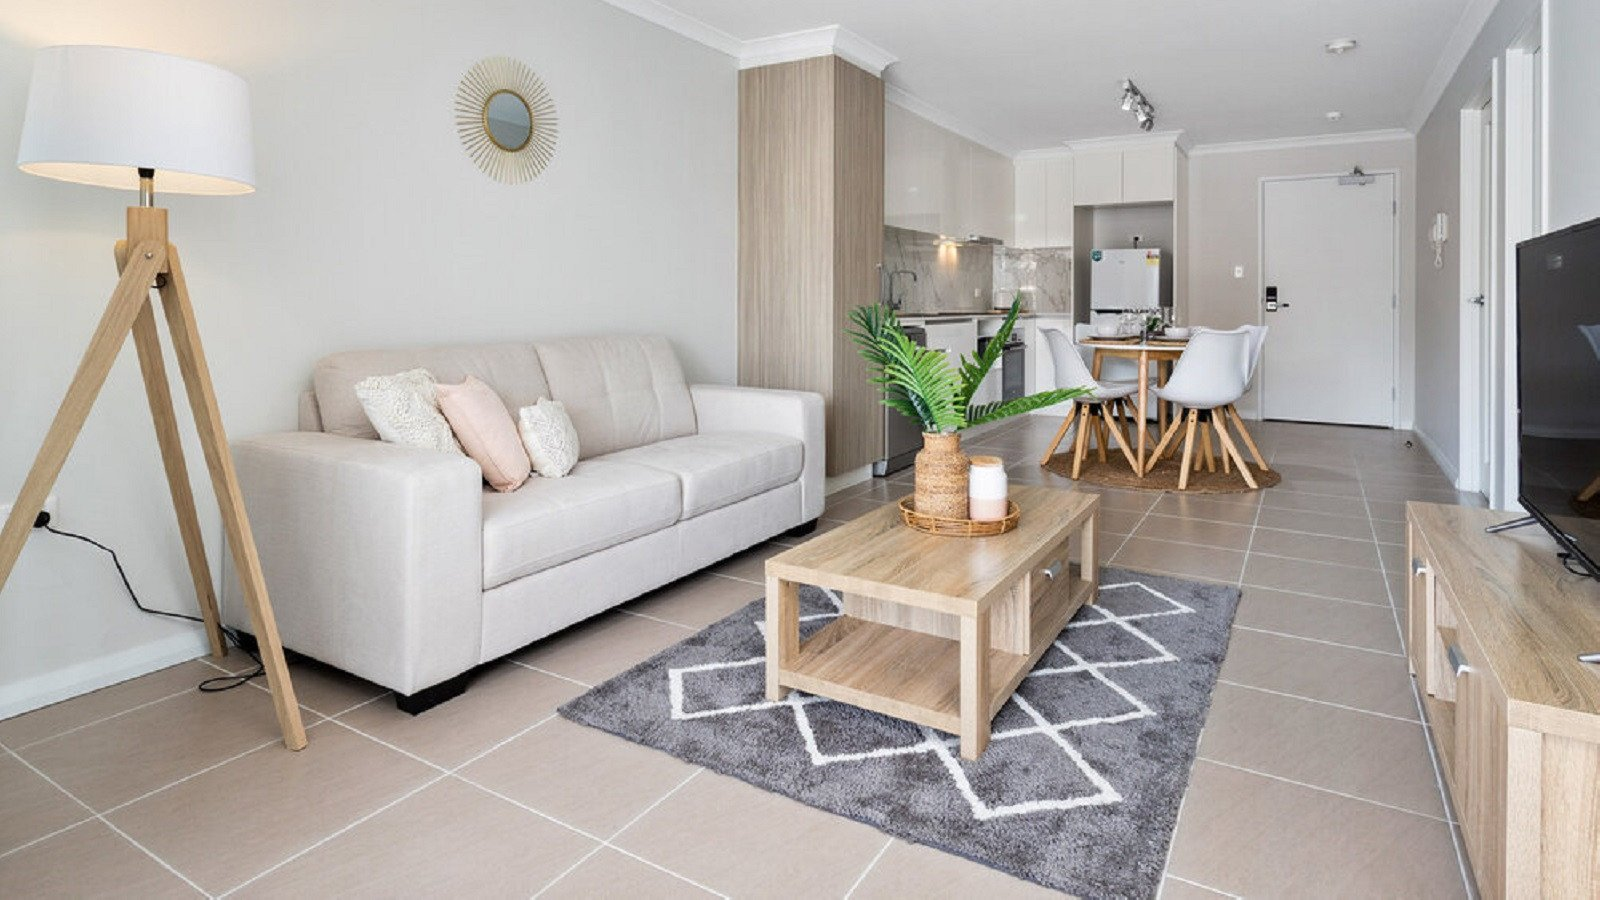 Lakeview Apartments, Westralia Gardens-image-0